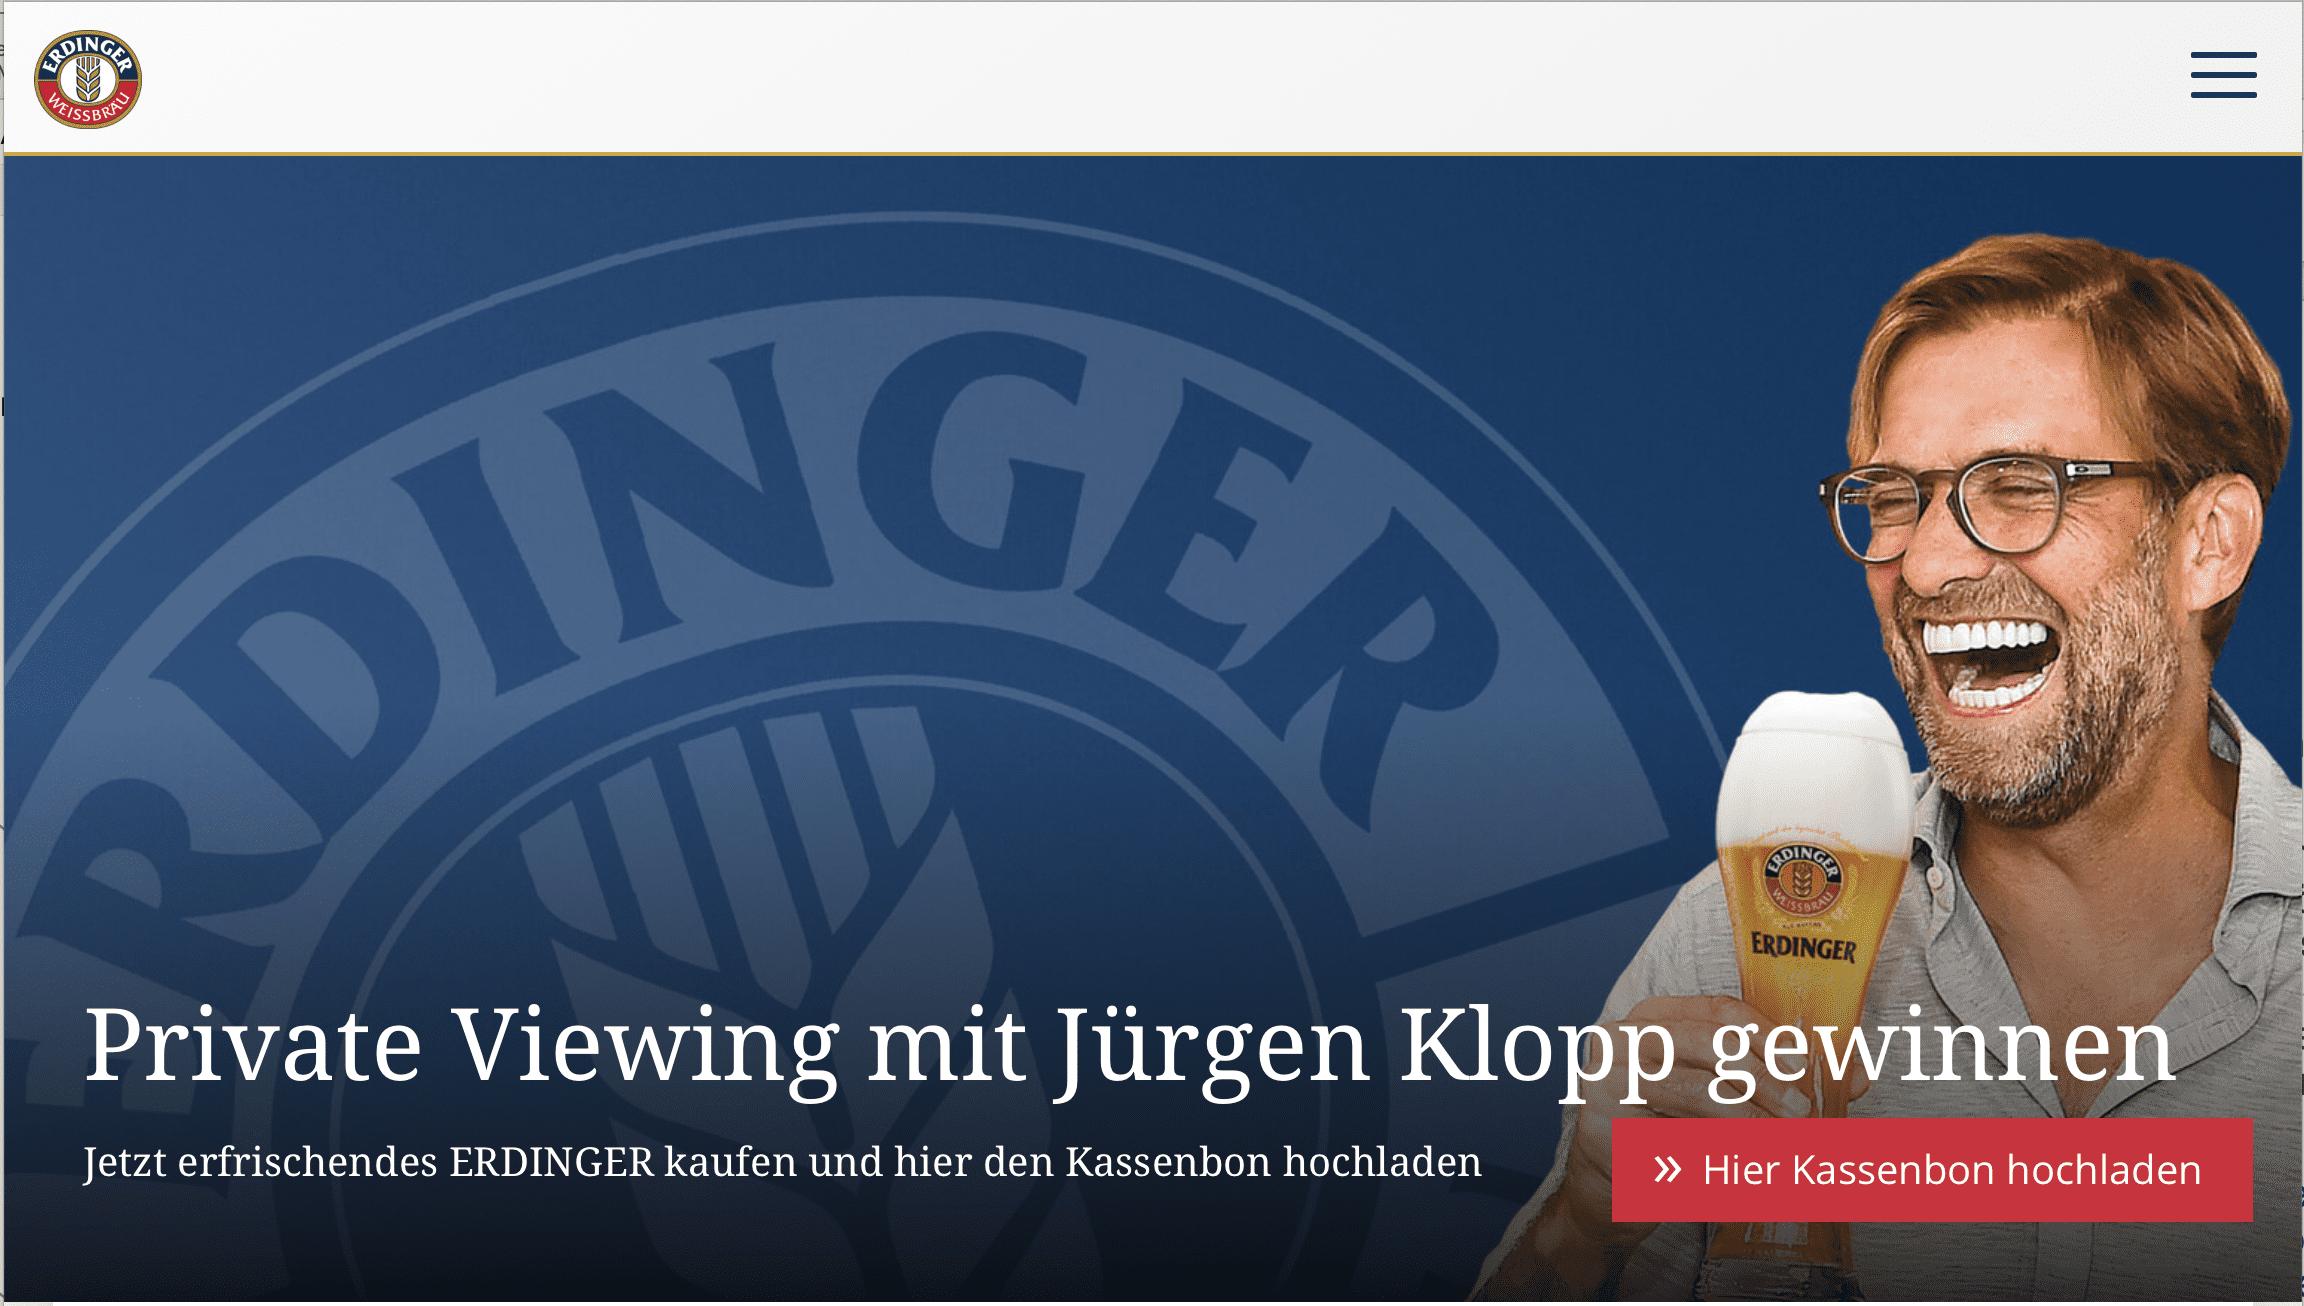 Erdinger Gewinnspiel Jürgen Klopp Gewinnspiel-Cases FMCG Getränke